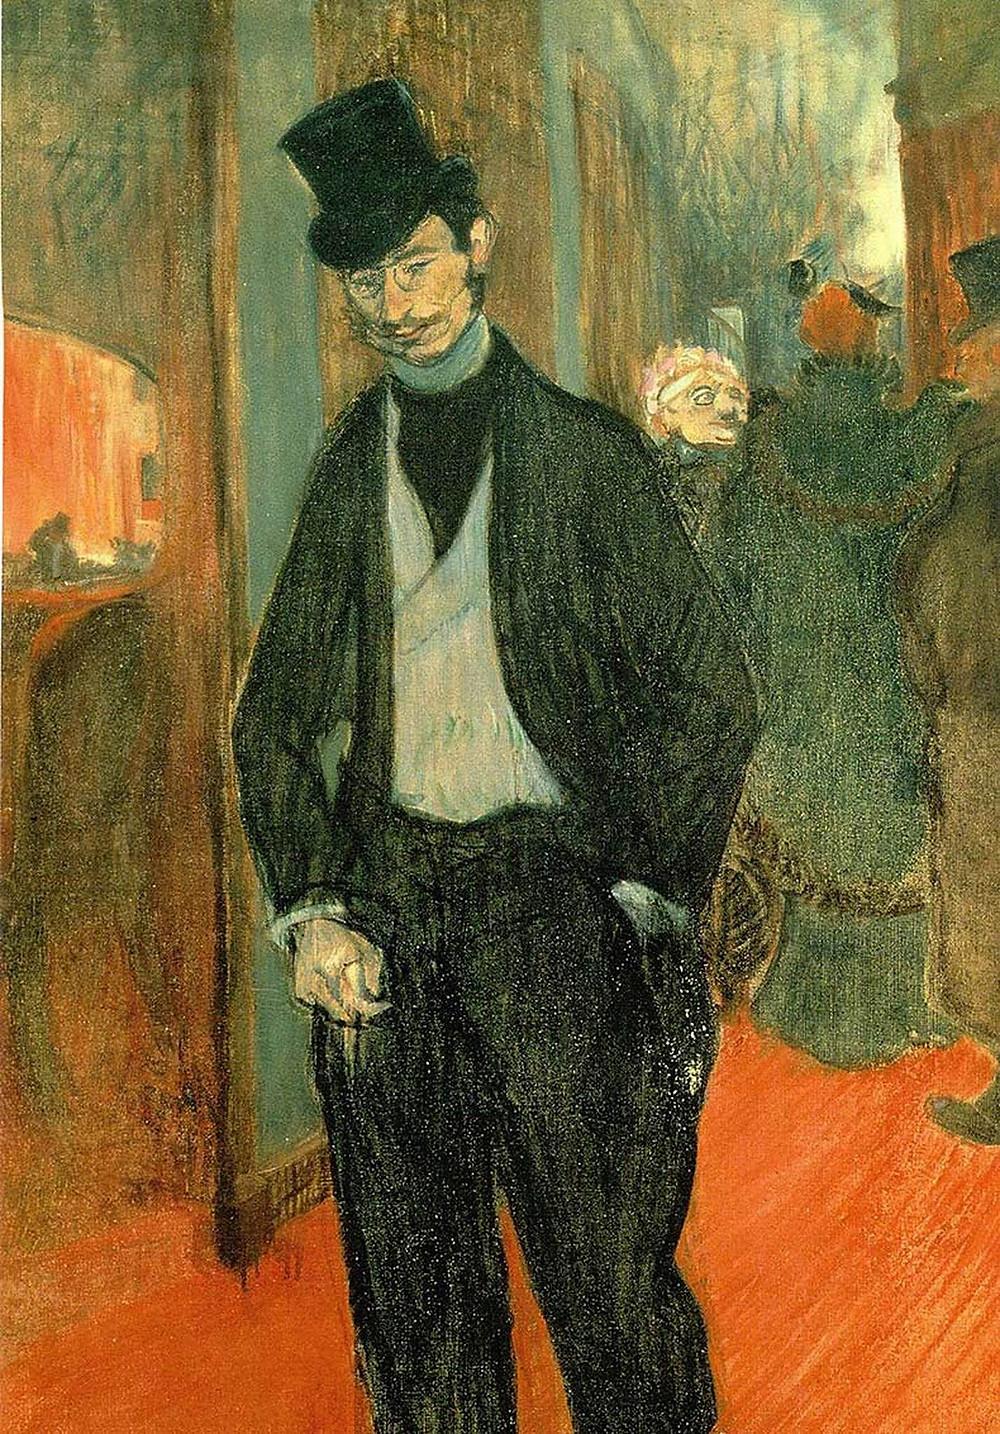 Toulouse-Lautrec, Gabriel Tapie de Celeyran in a Theatre Corridor, 1894